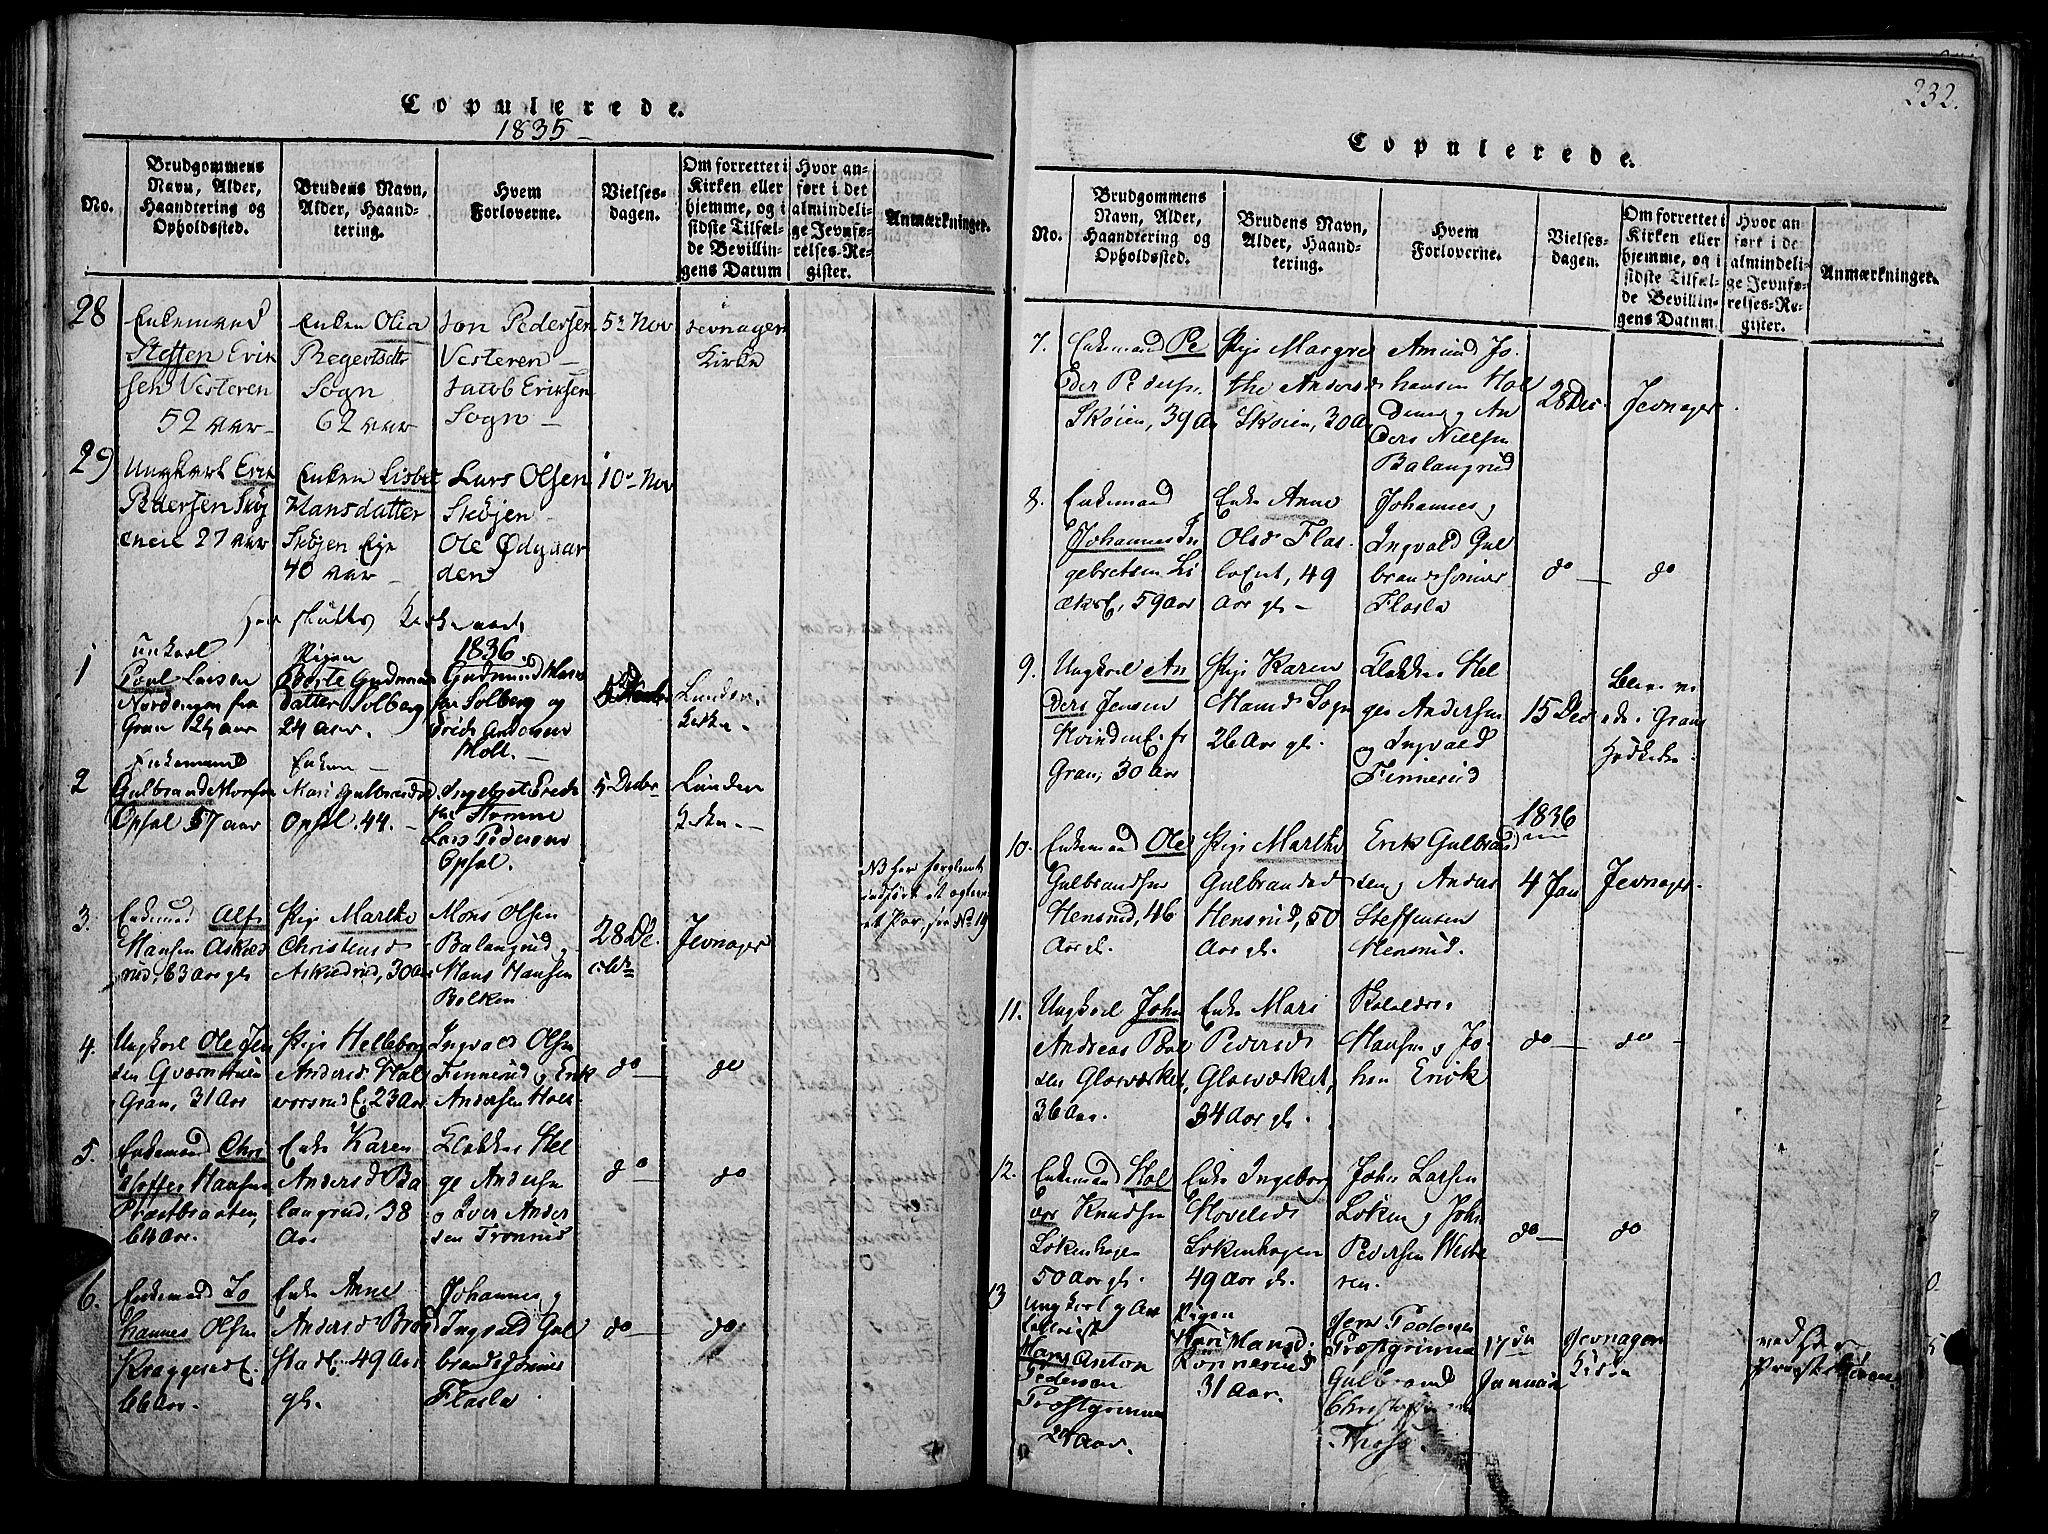 SAH, Jevnaker prestekontor, Ministerialbok nr. 5, 1815-1837, s. 232